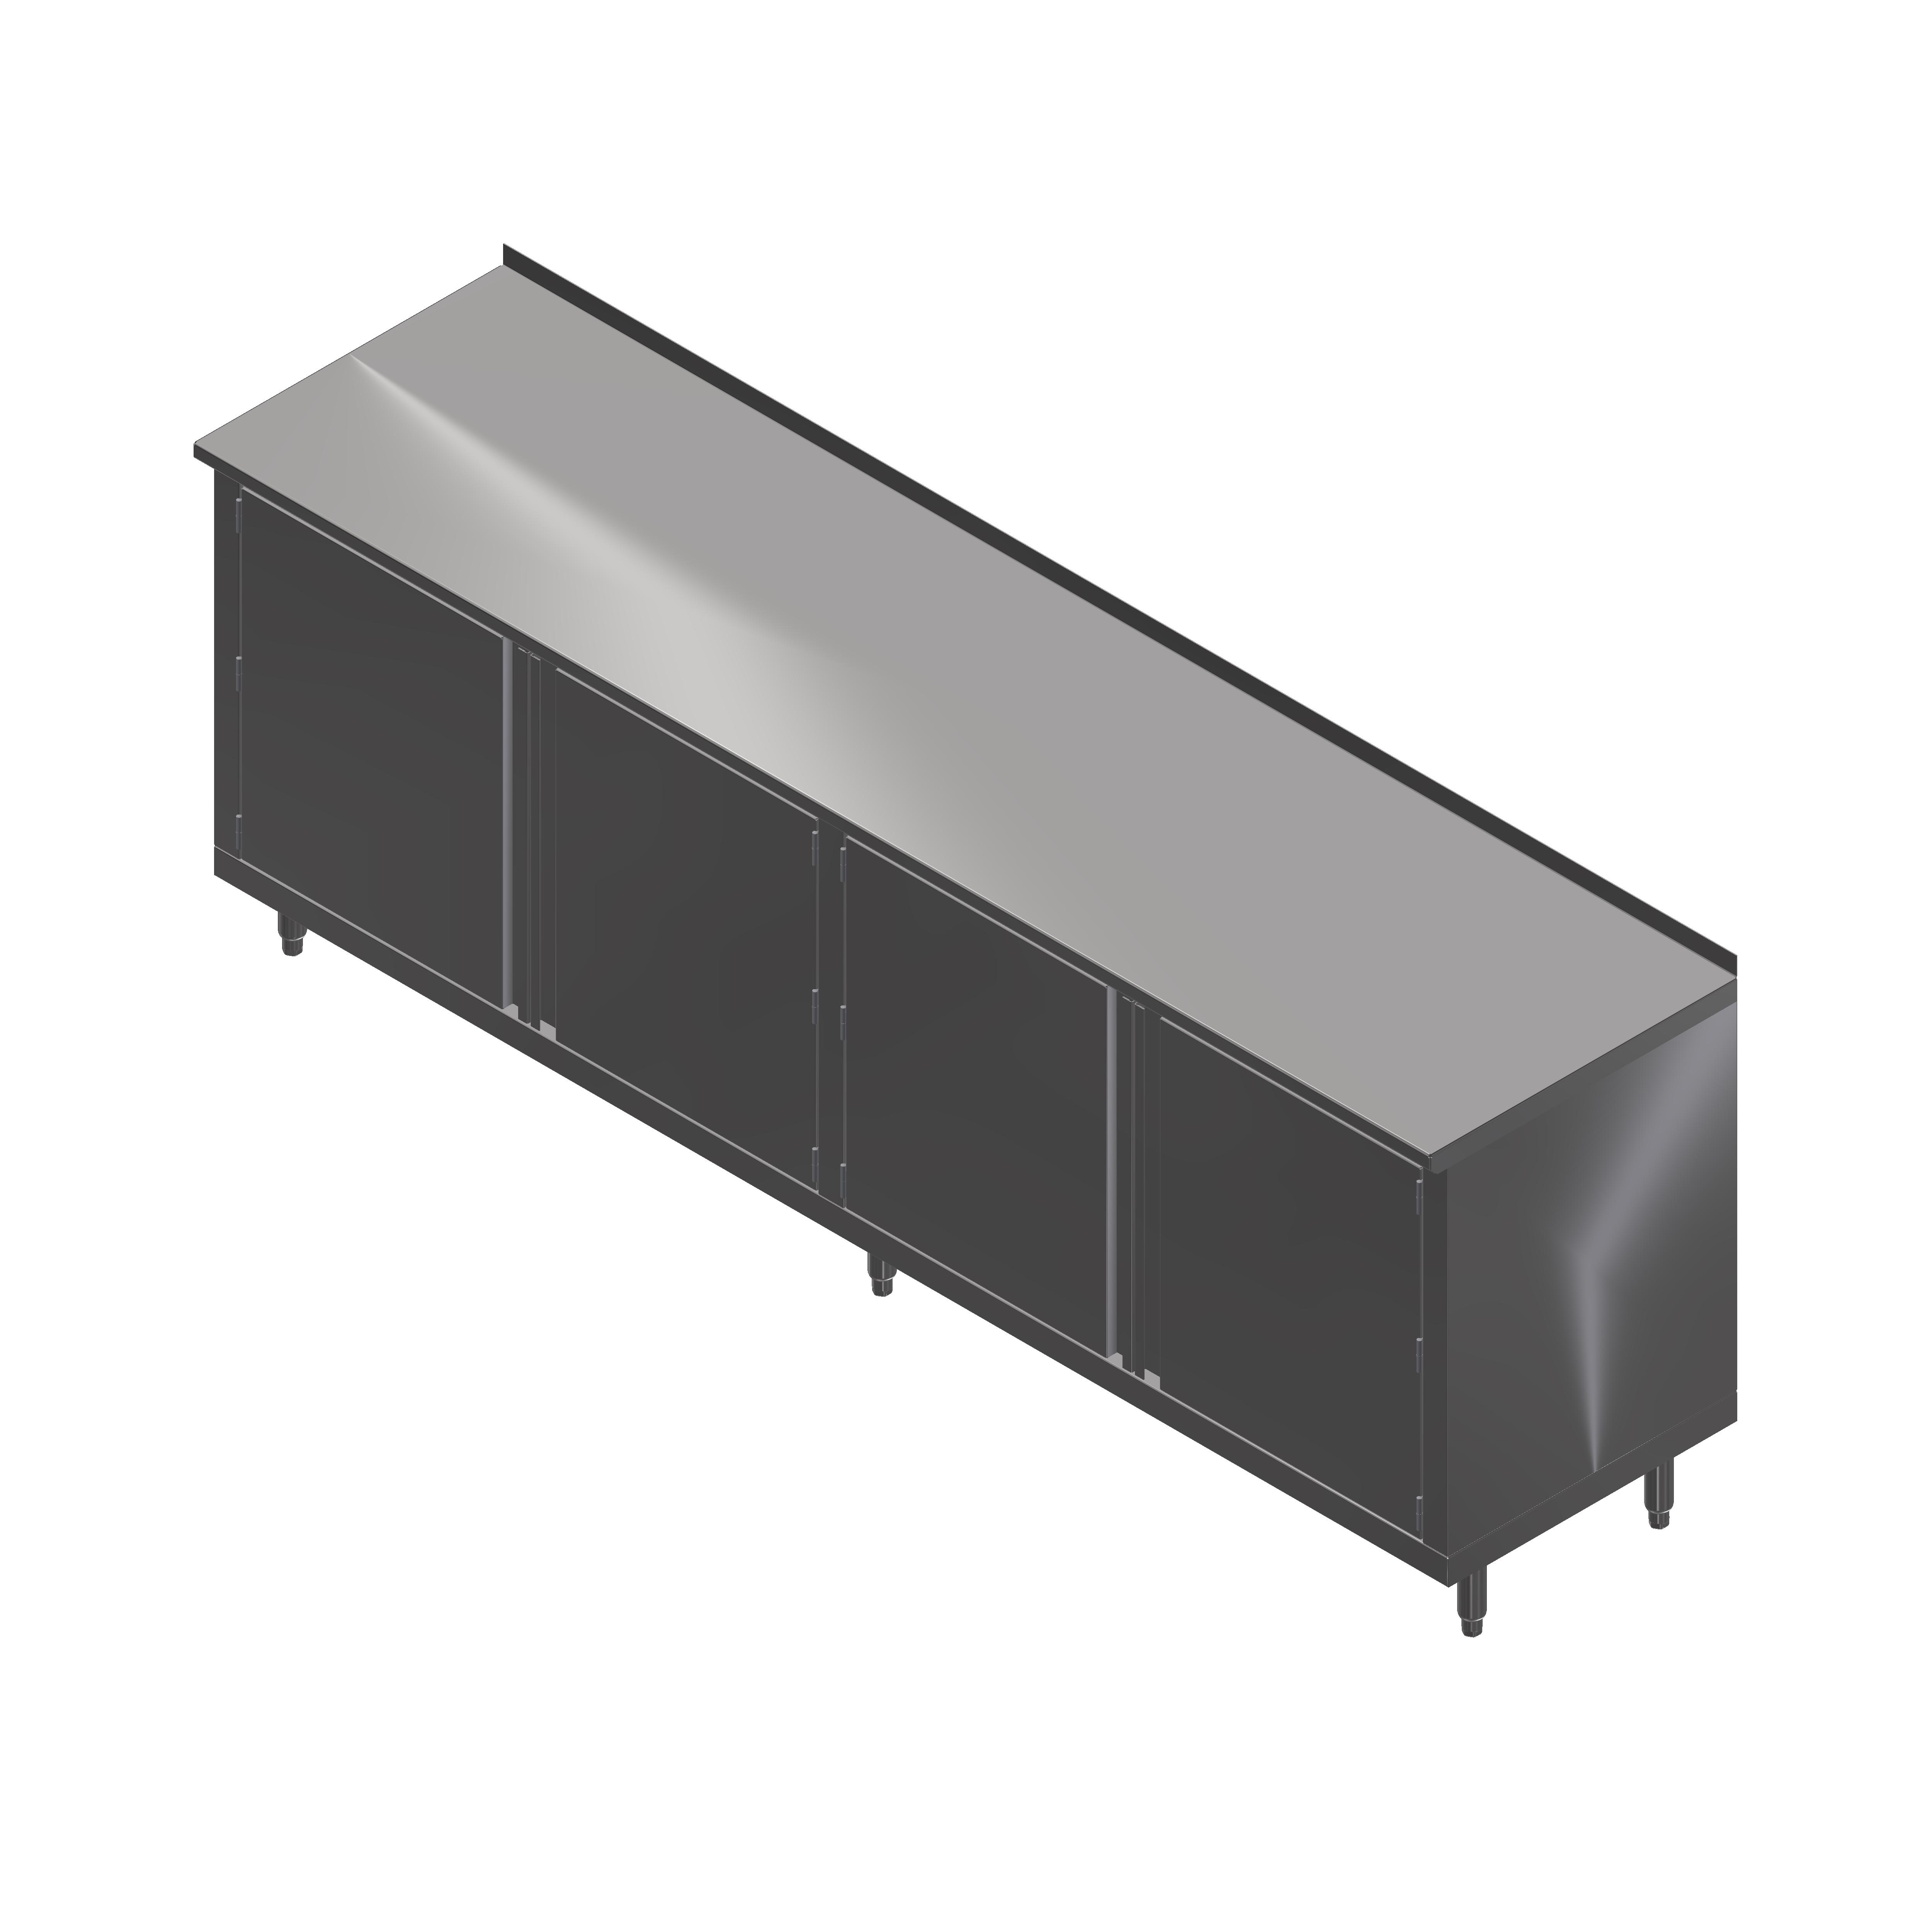 John Boos 4CH4R1.5-30144 work table, cabinet base hinged doors